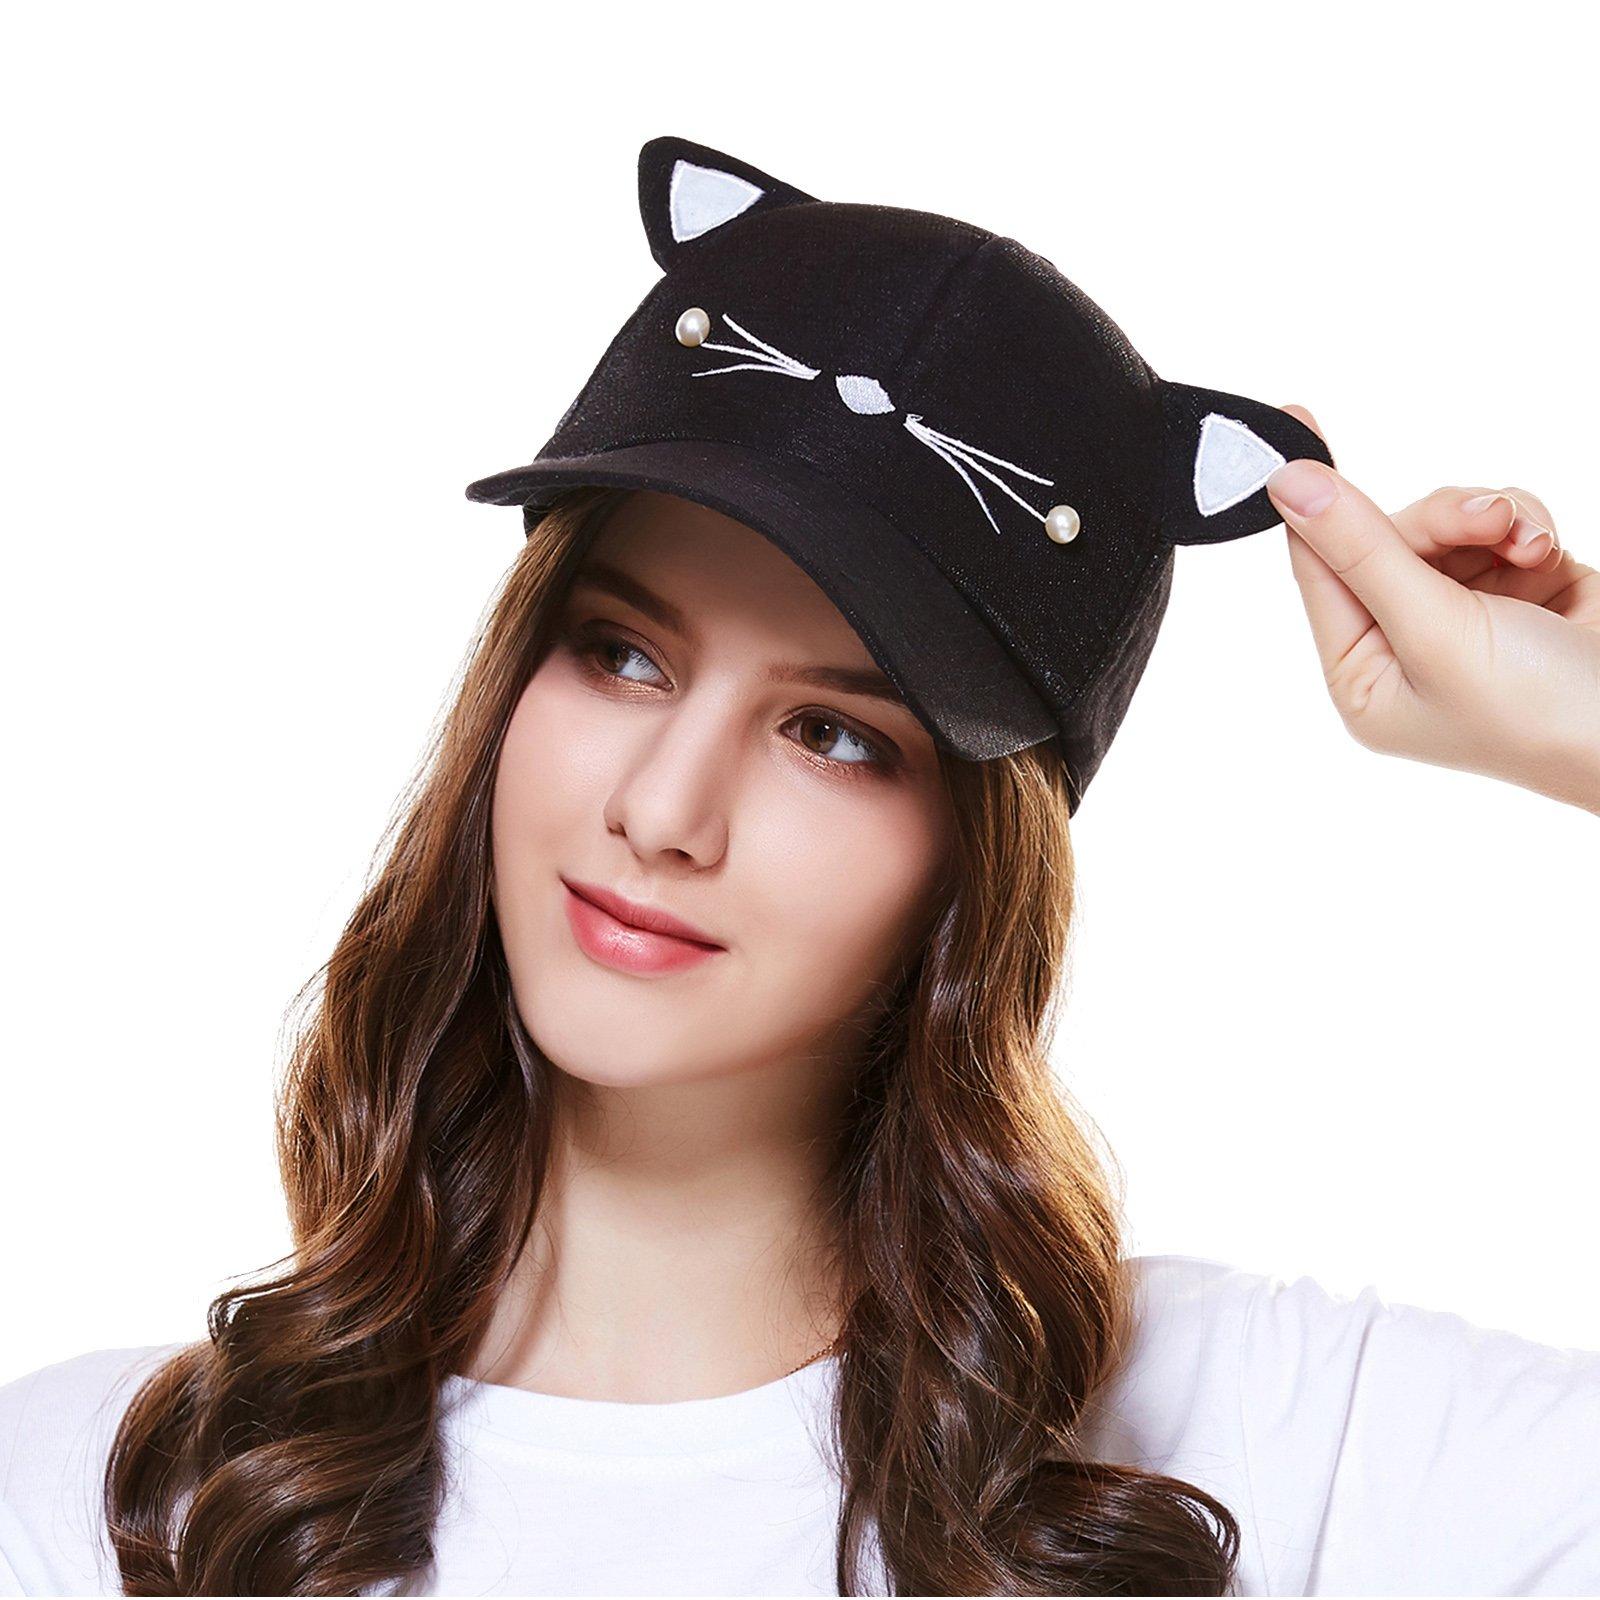 Women Cute Cat Embroidered Adjustable Baseball Cap Hat